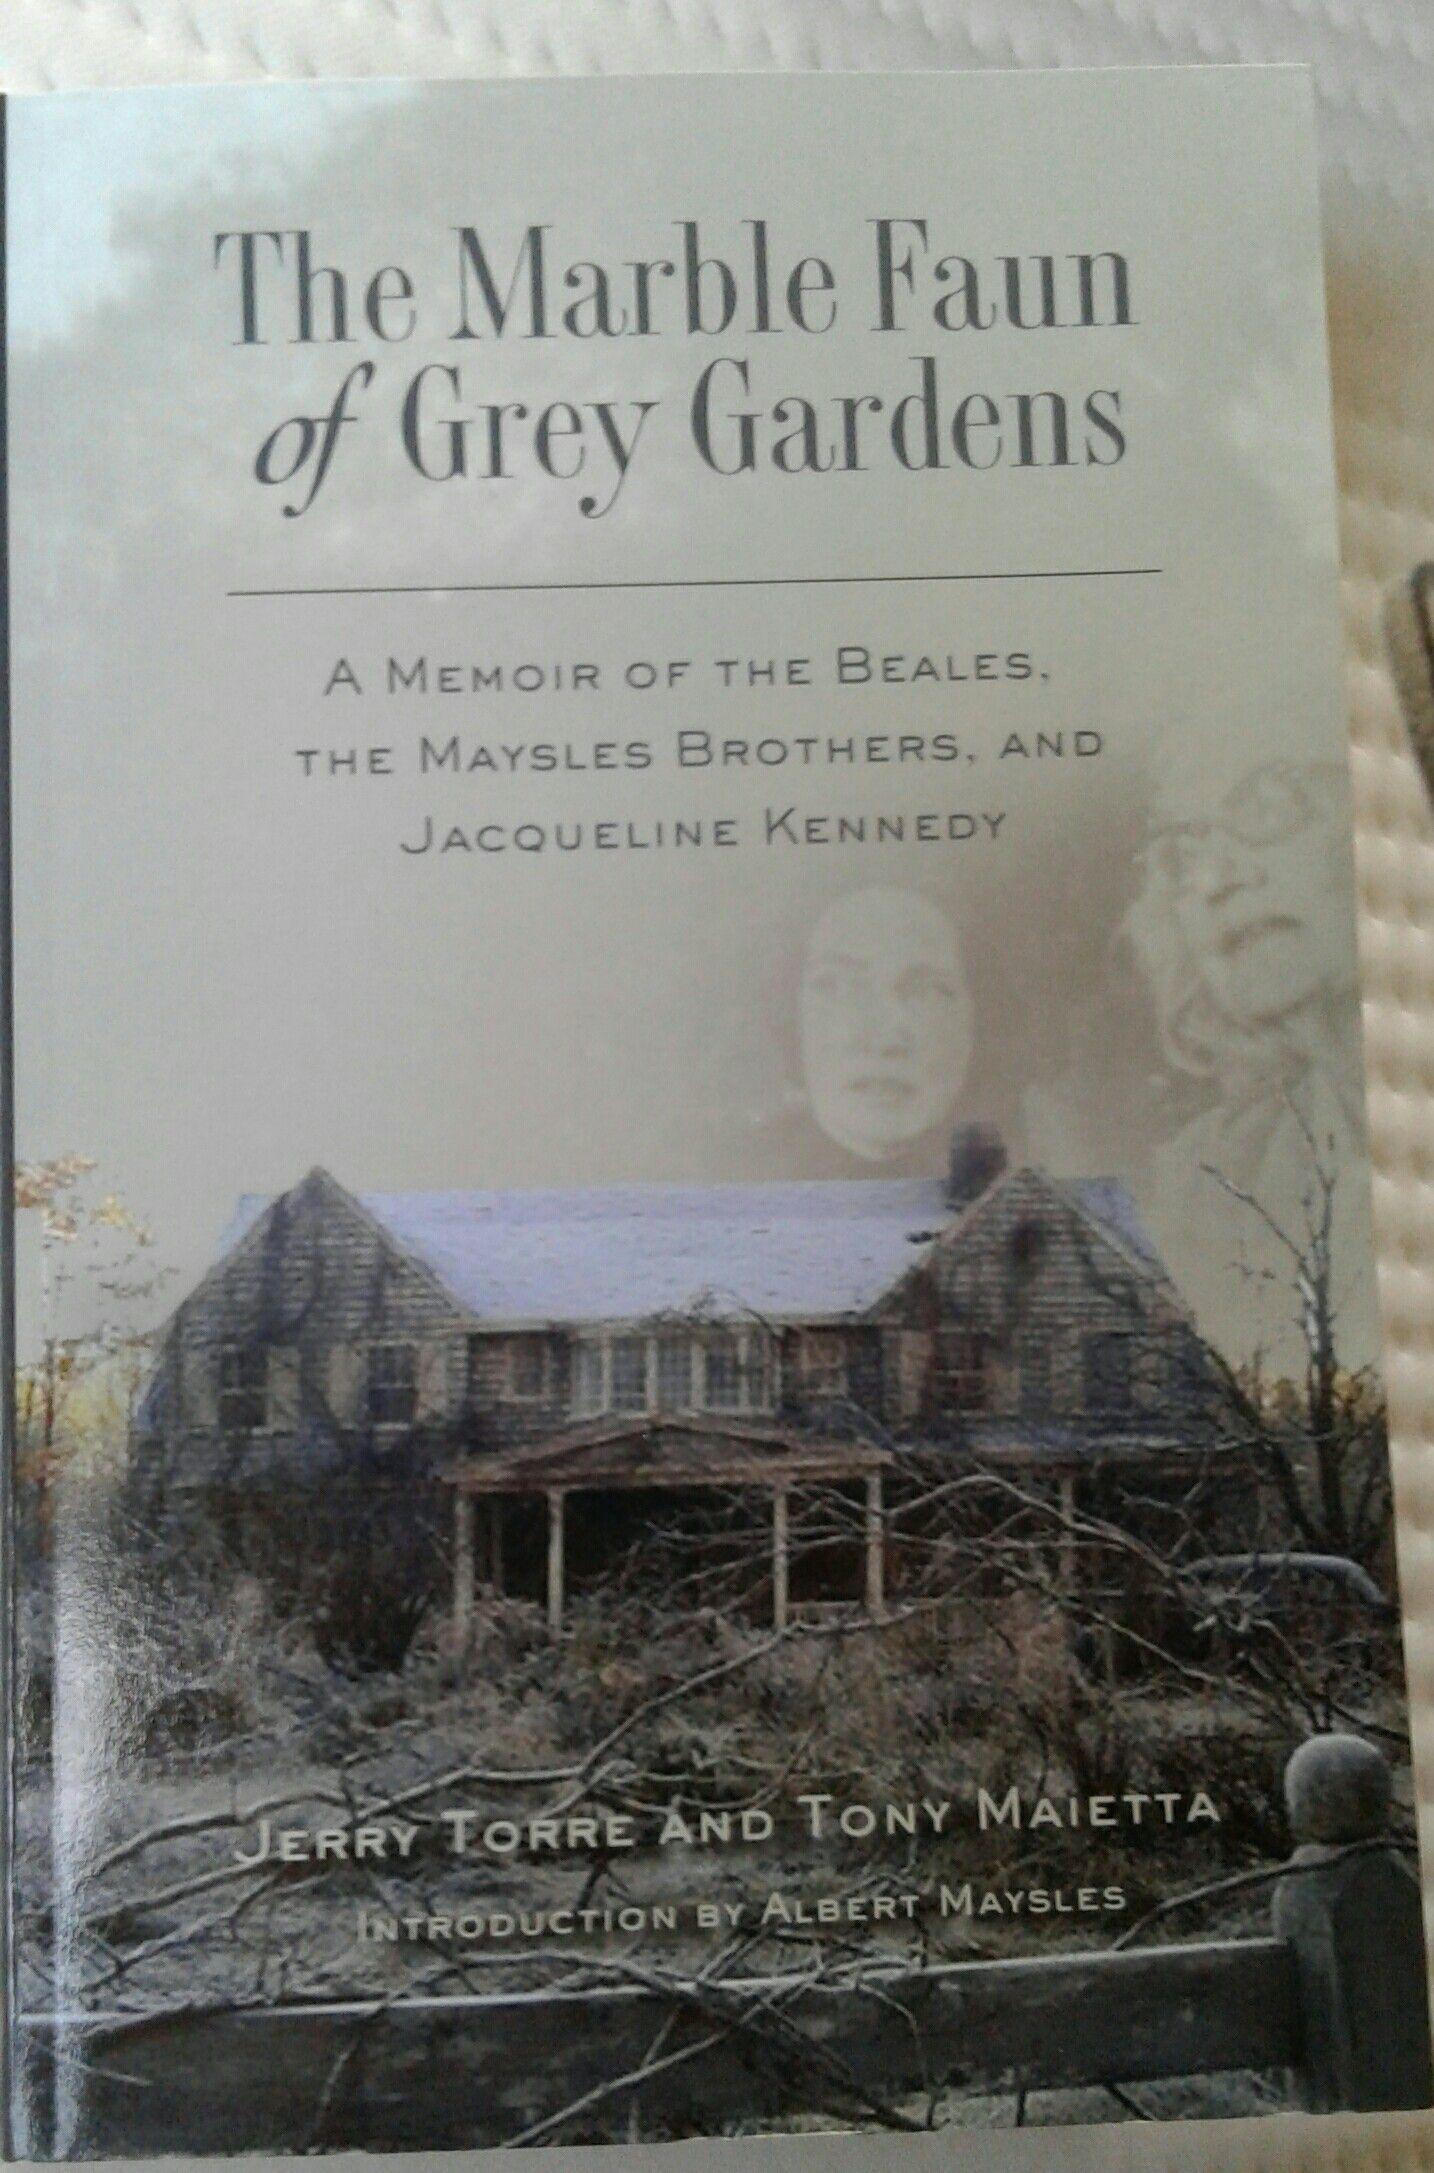 654801b473d0a616dc7a7cca4e306c4e - The Marble Faun Of Grey Gardens Documentary